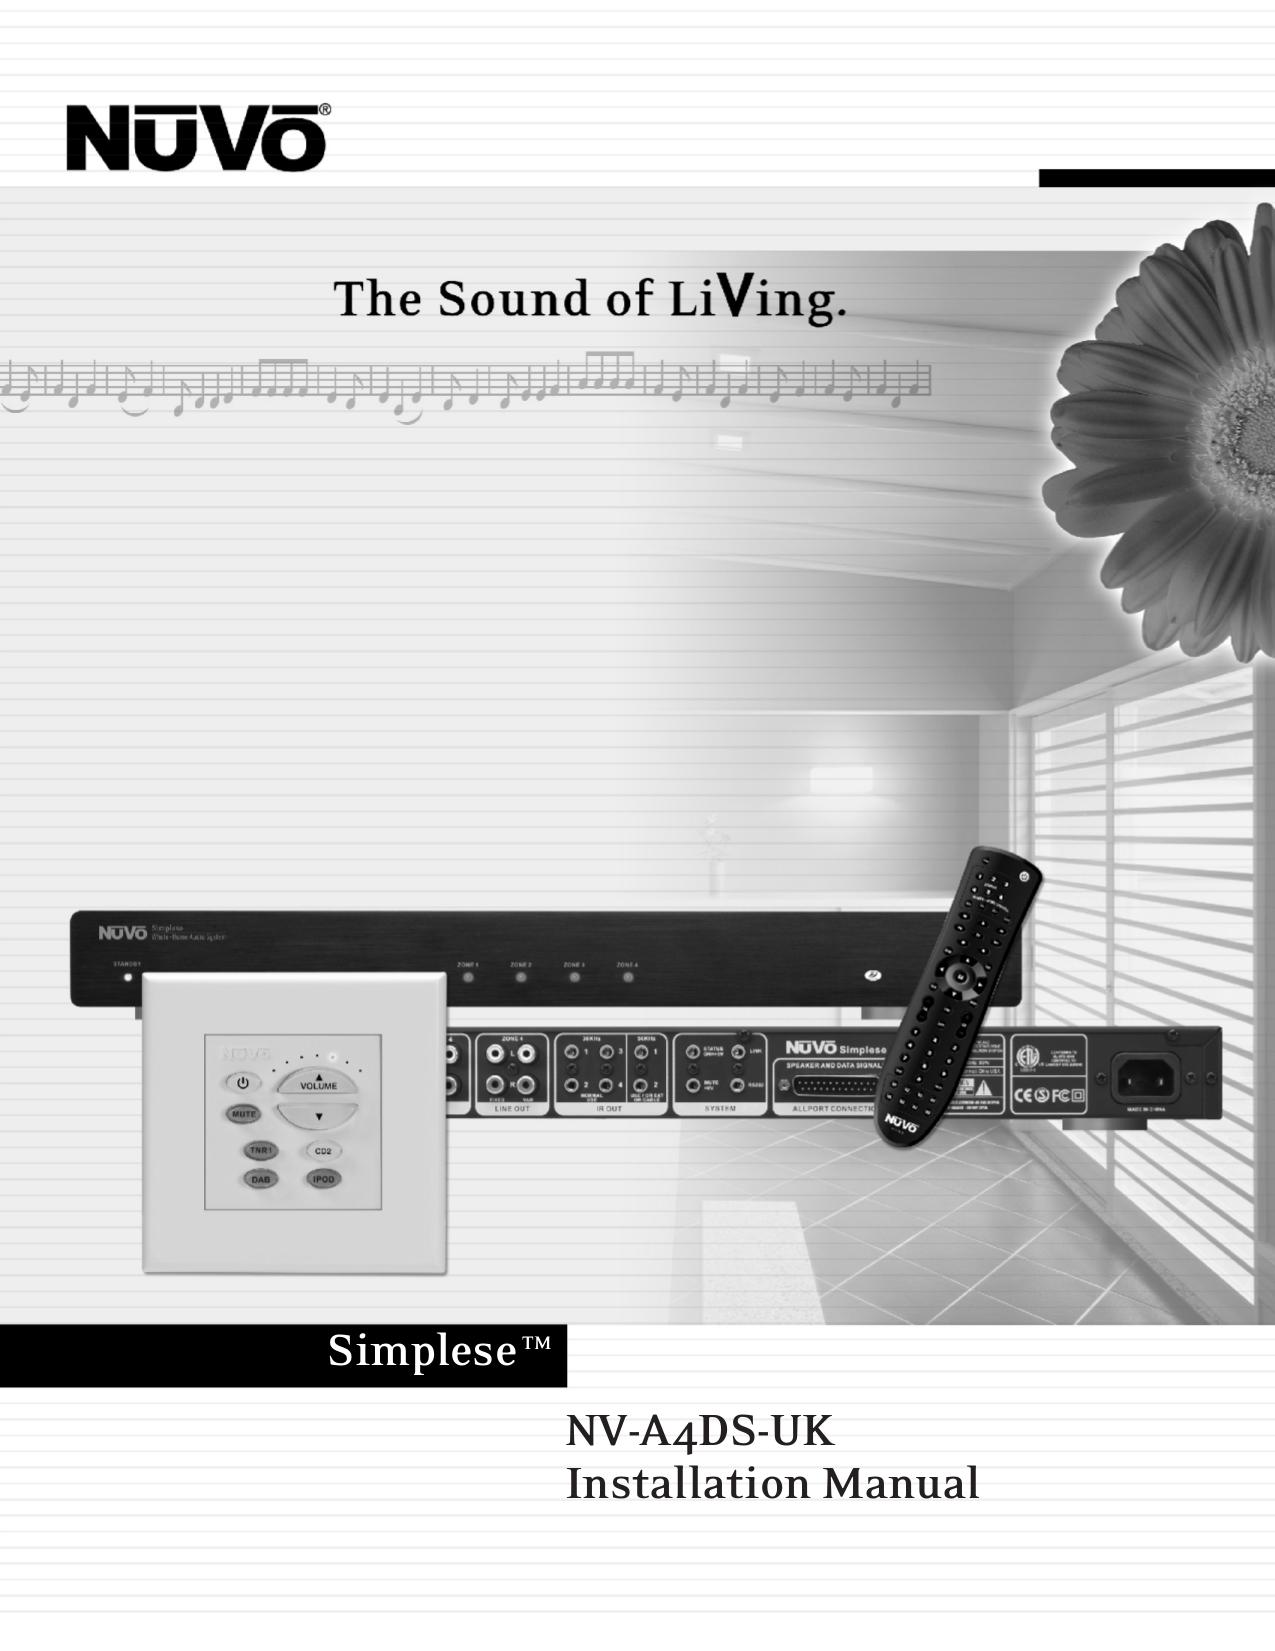 NVA4D UK_installation_manual.pdf 0 download free pdf for nuvo nv p2100 amp manual nuvo simplese wiring diagram at virtualis.co